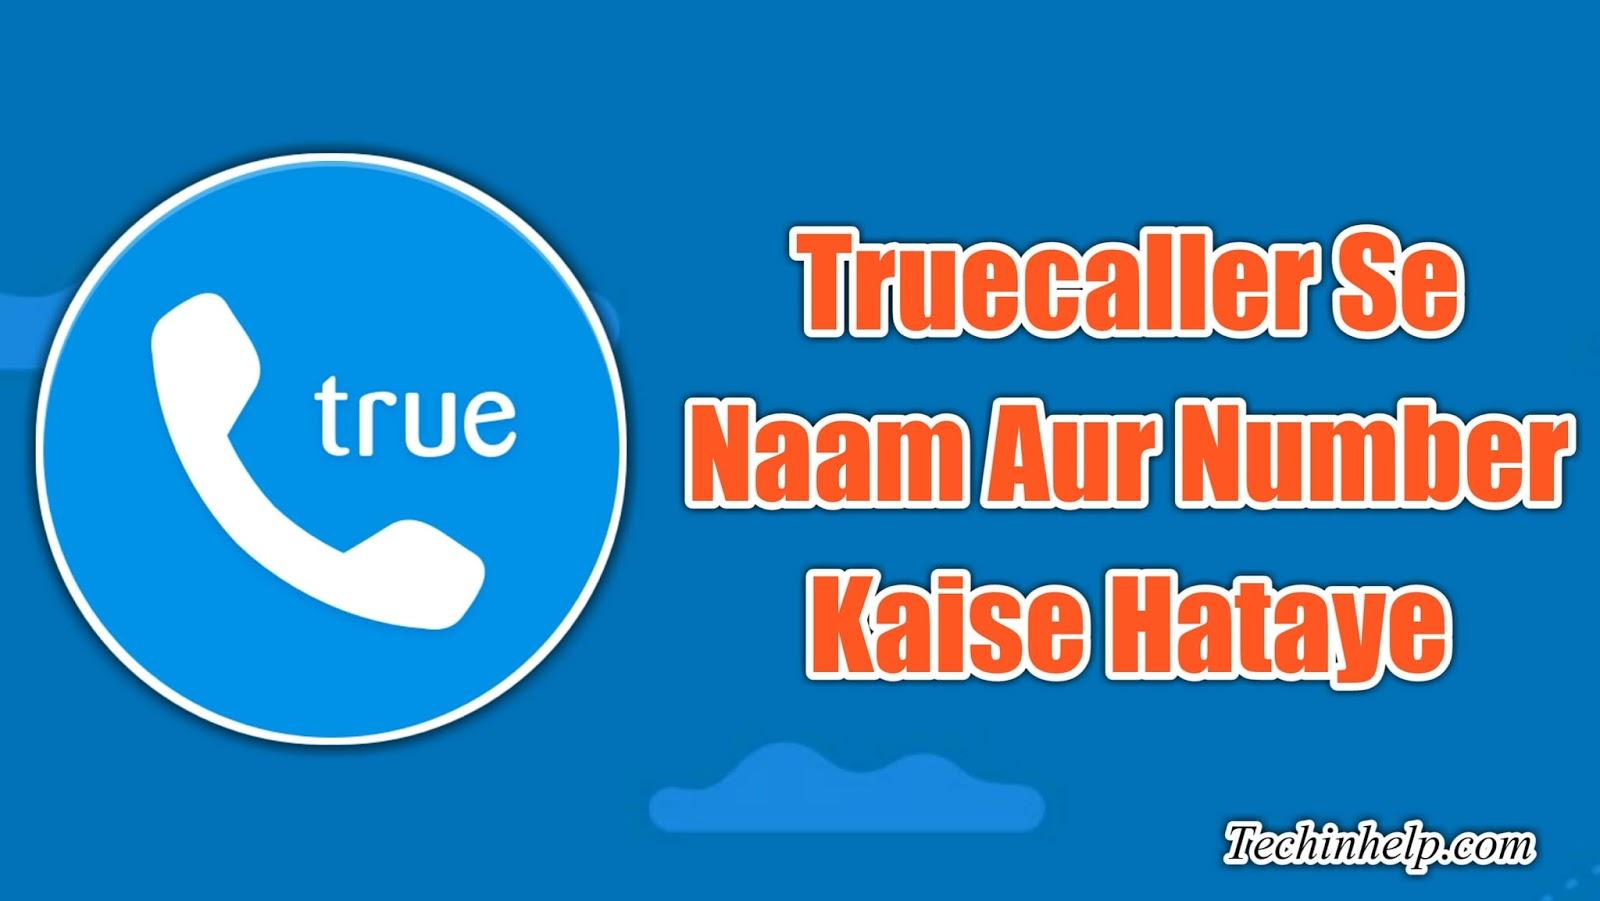 Truecaller se naam aur number kaise hataye